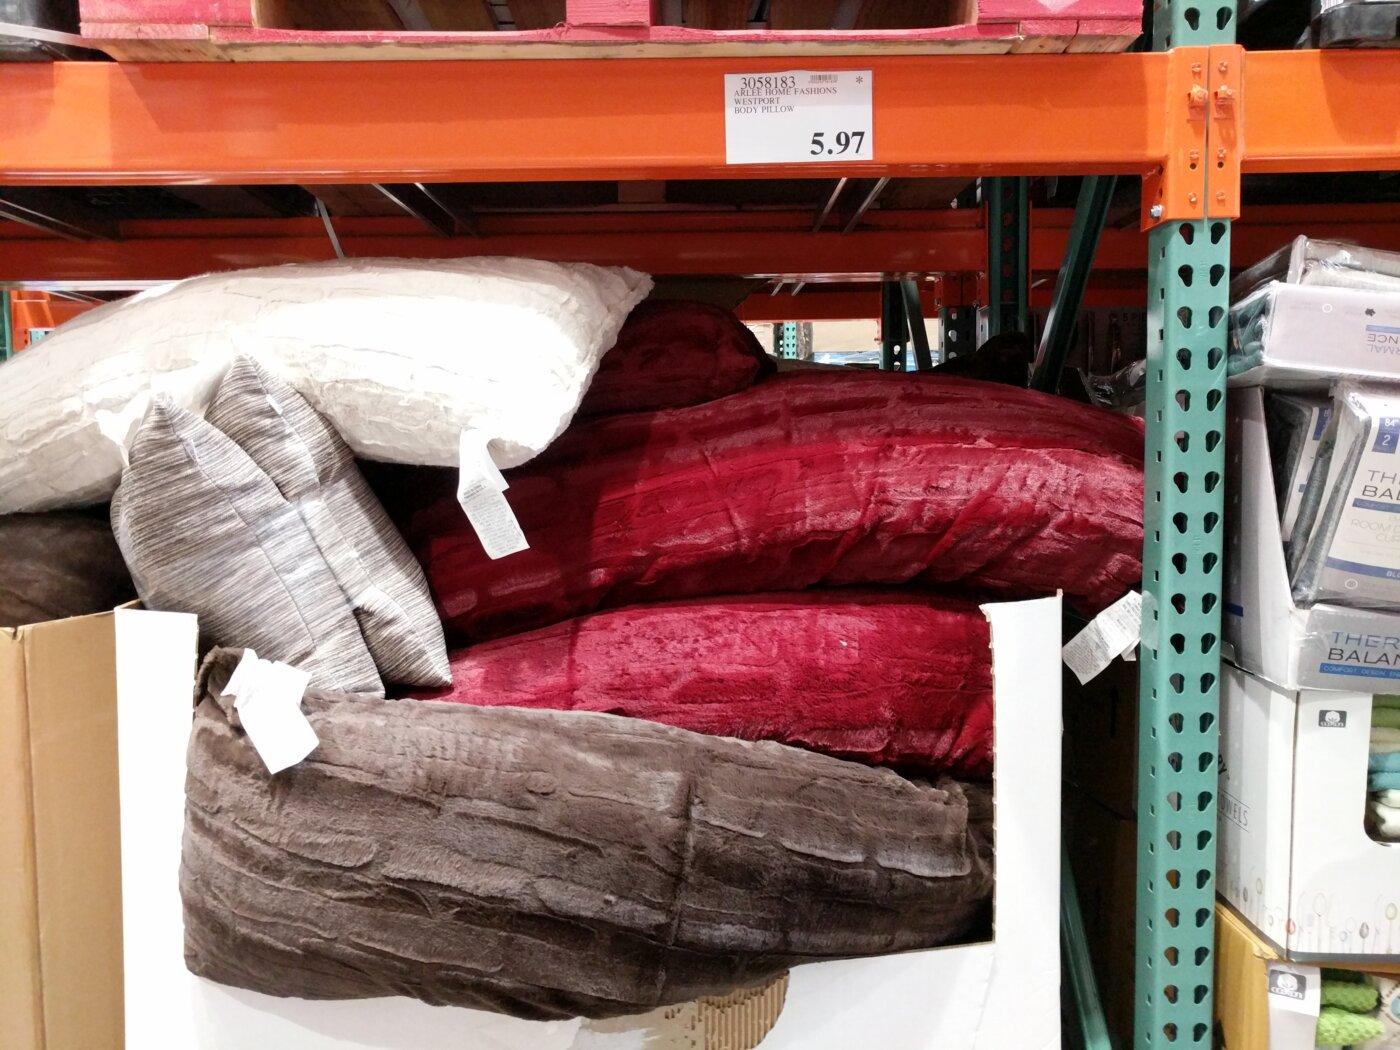 Arlee Decorative Body Pillow : Arlee Home Fashions Westport Body Pillow Costco97.com